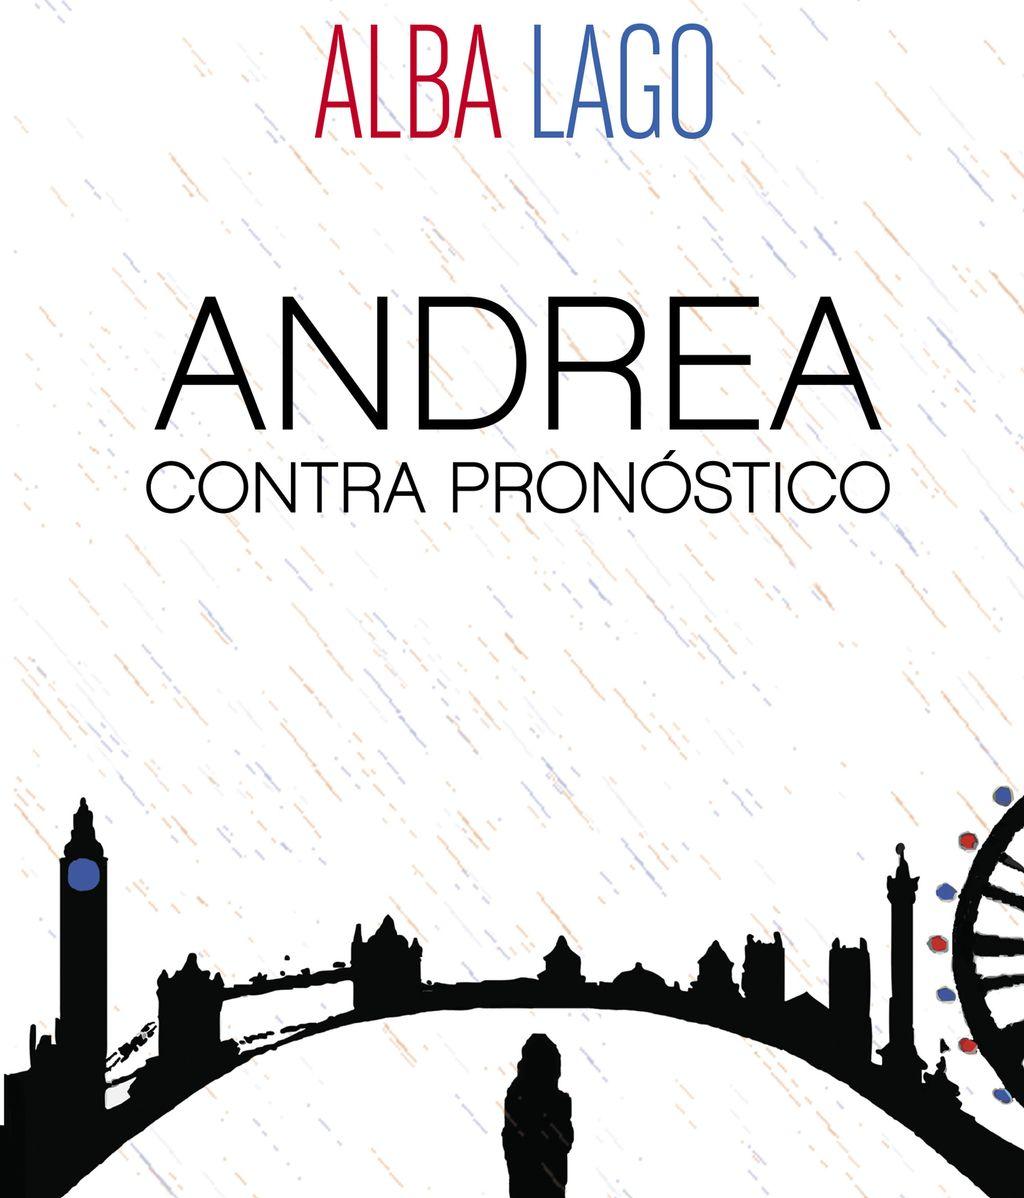 Andrea contra pronóstico de Alba Lago